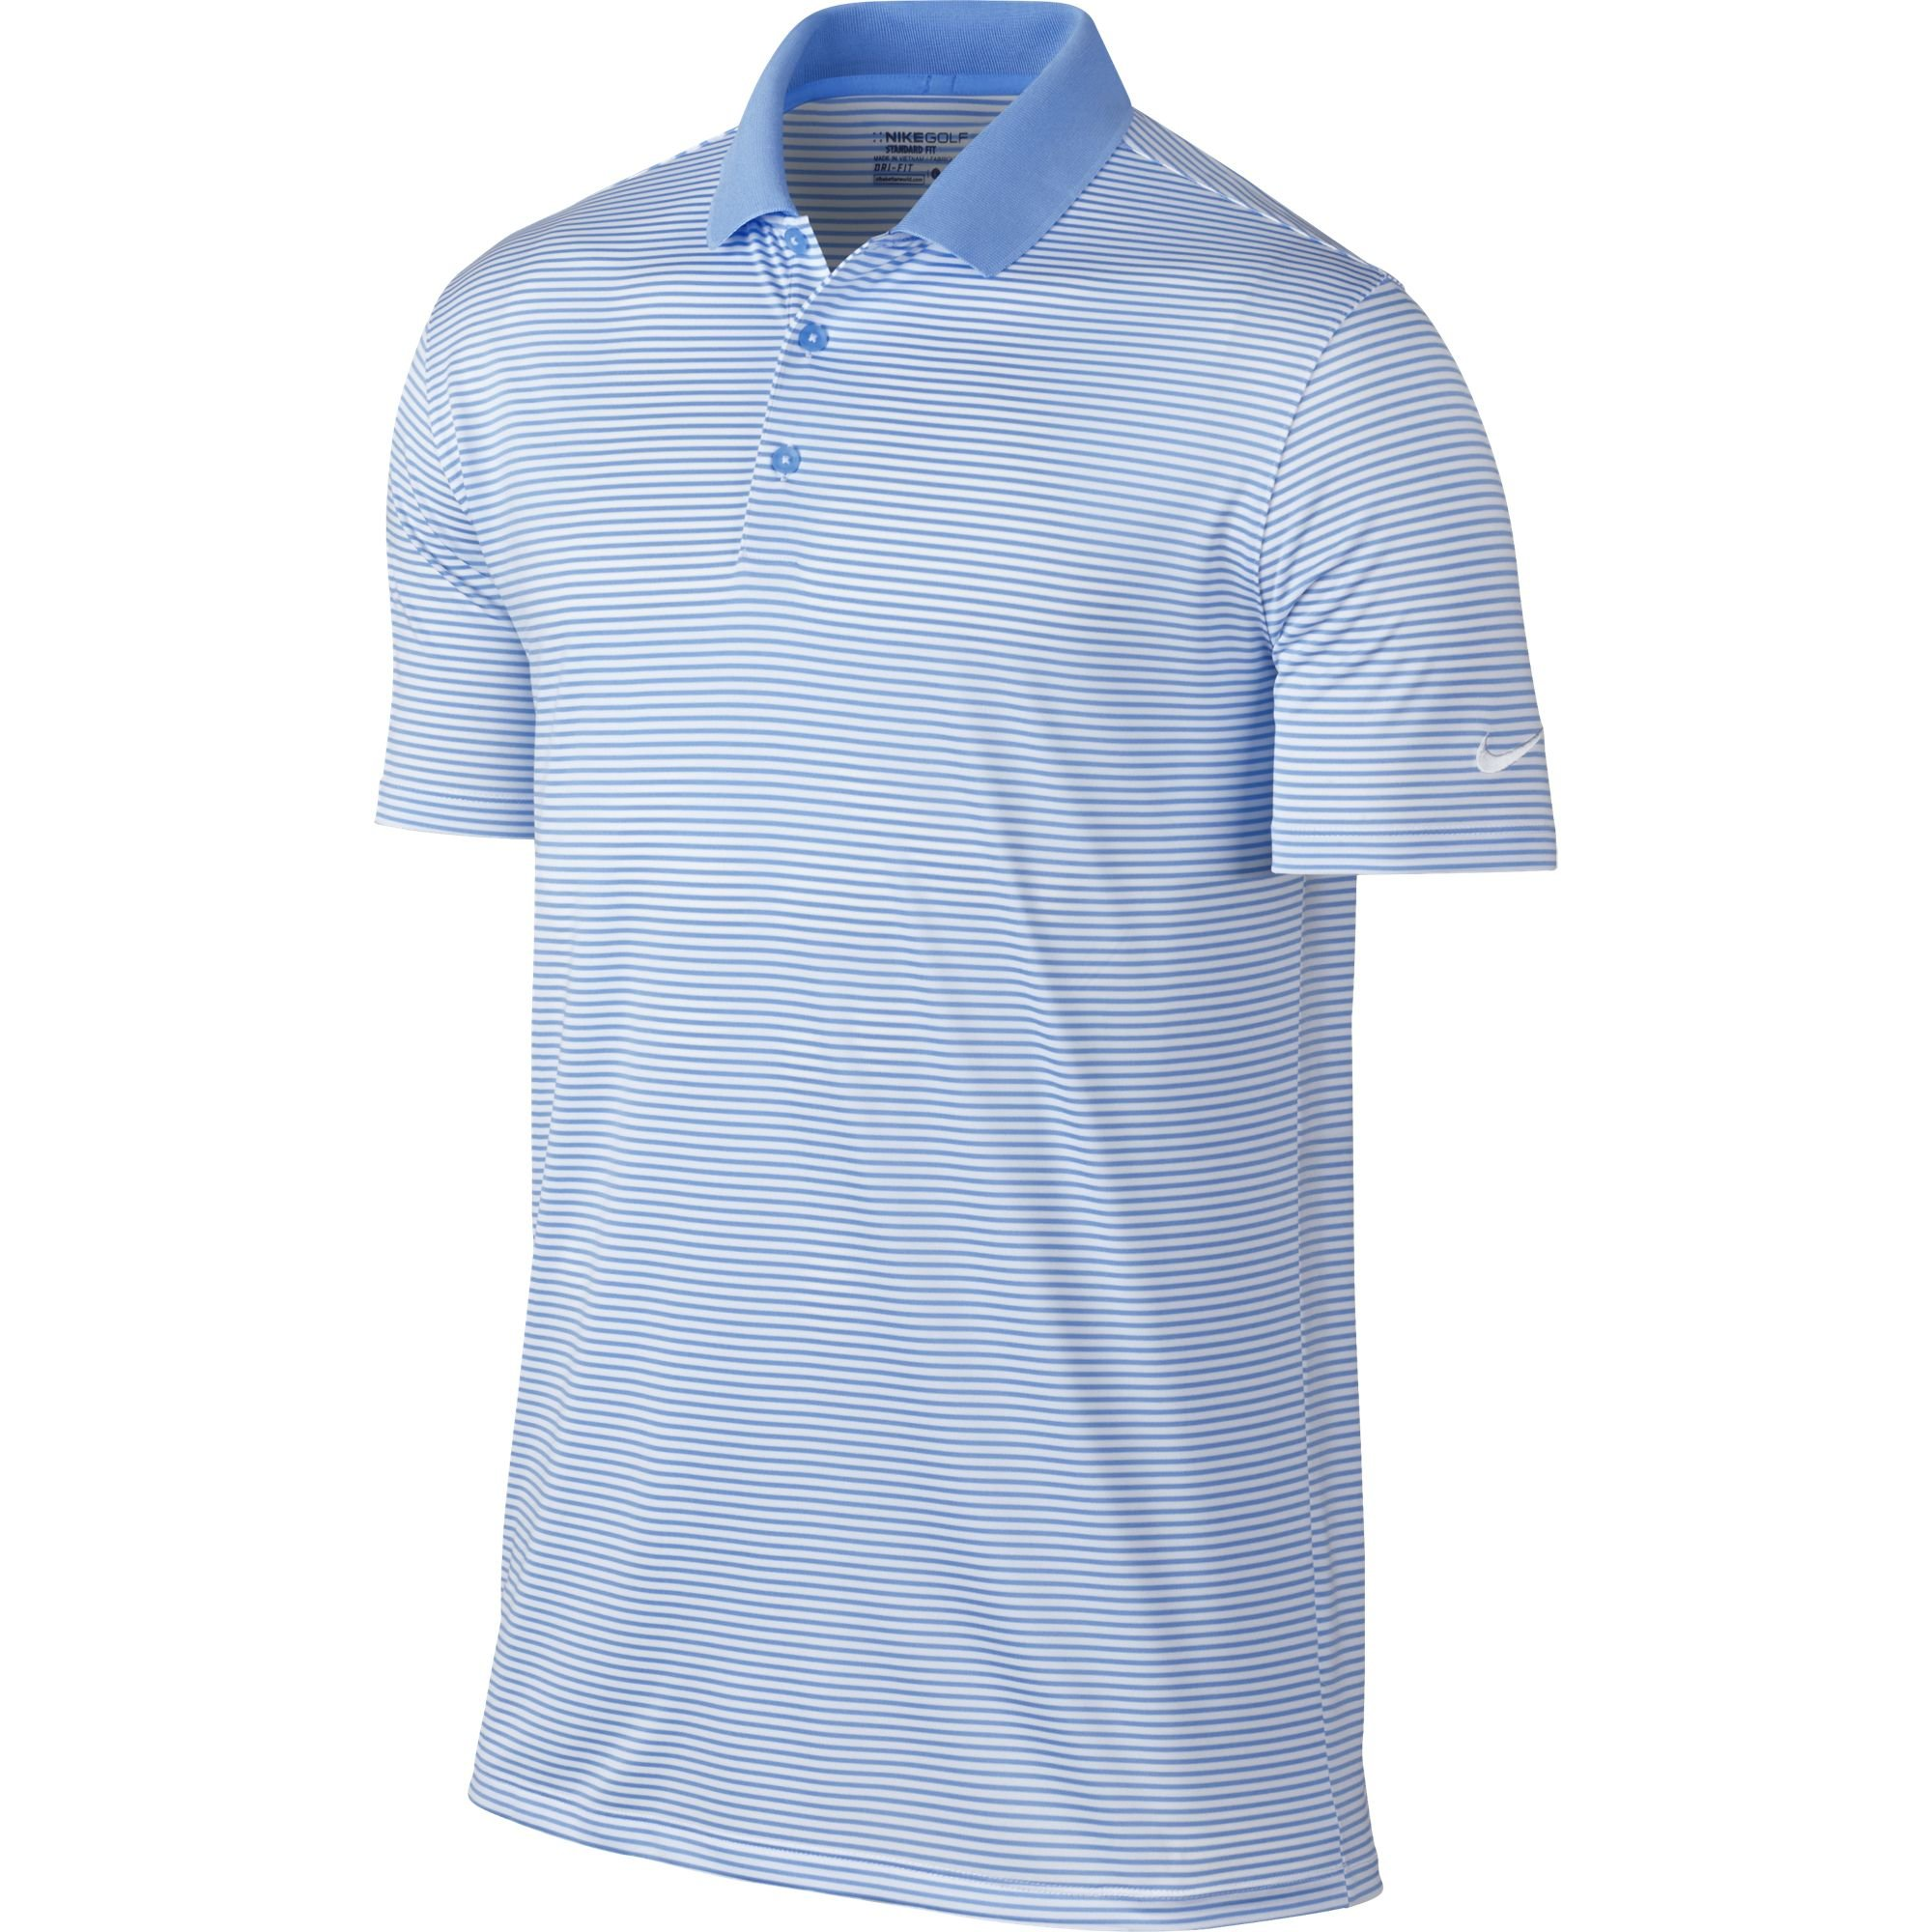 Nike Golf Victory Mini Stripe Polo (University Blue/White) (3XL)